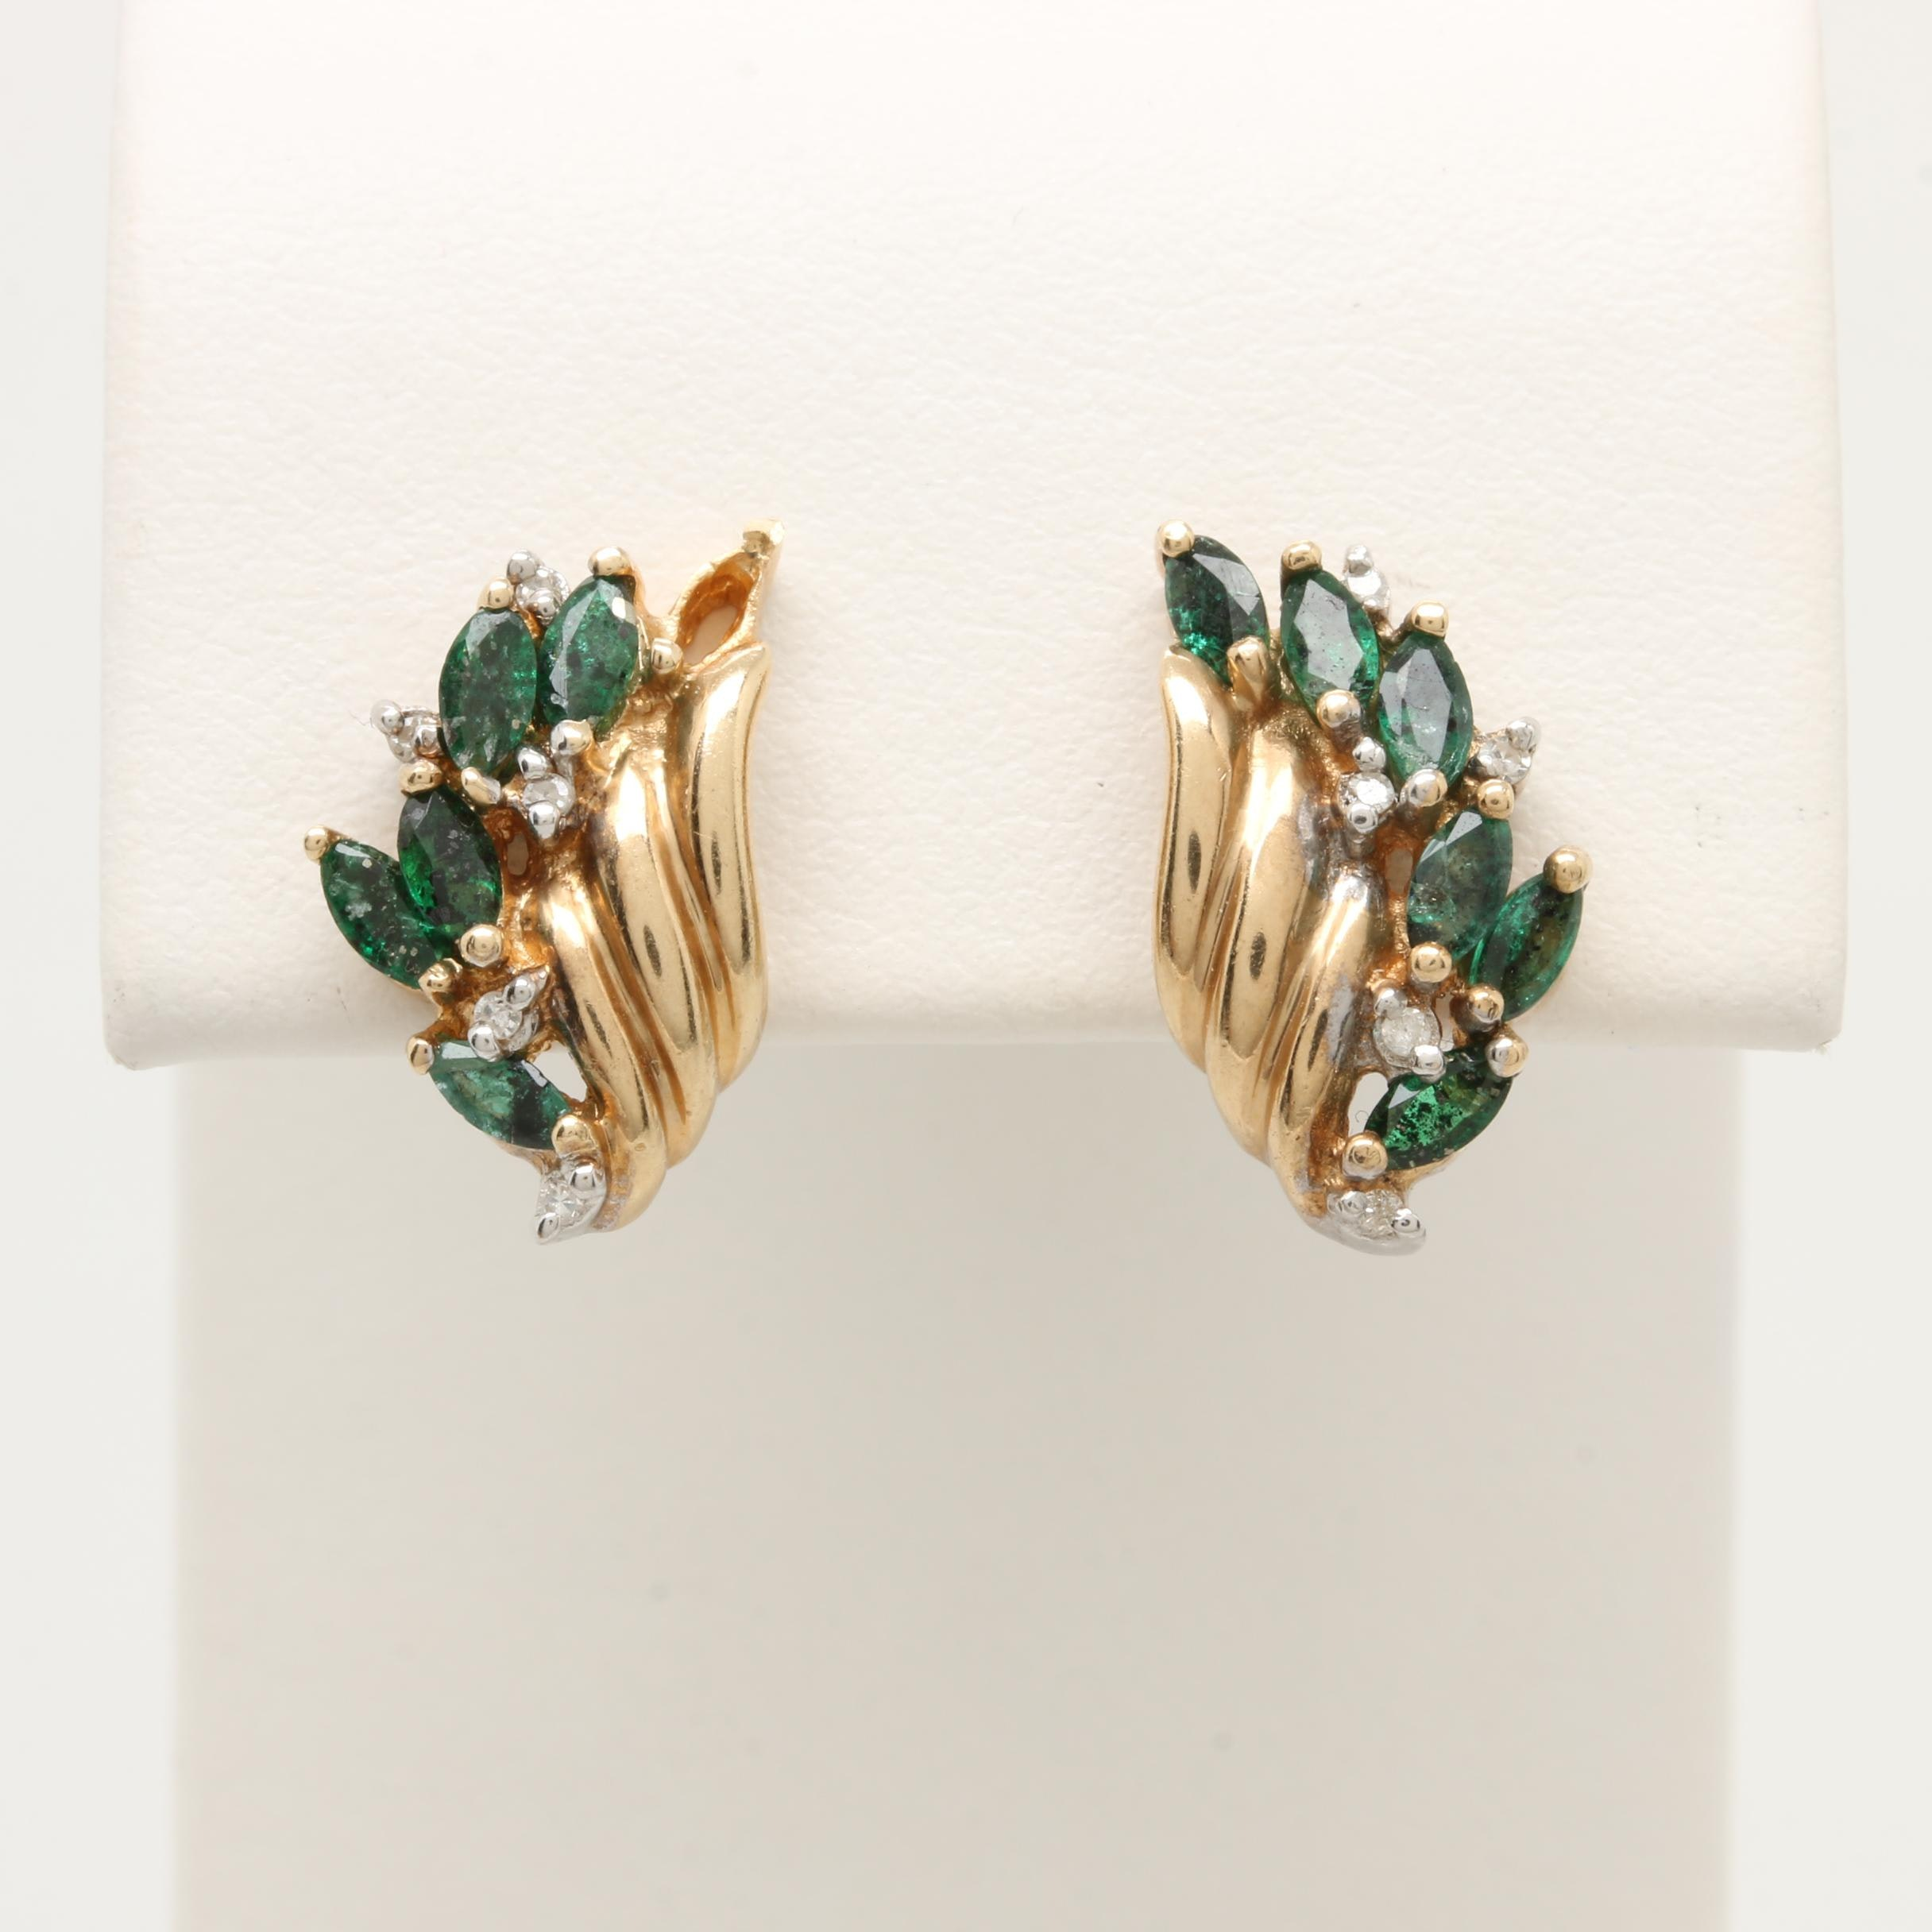 10K Yellow Gold Emerald and Diamond Earrings